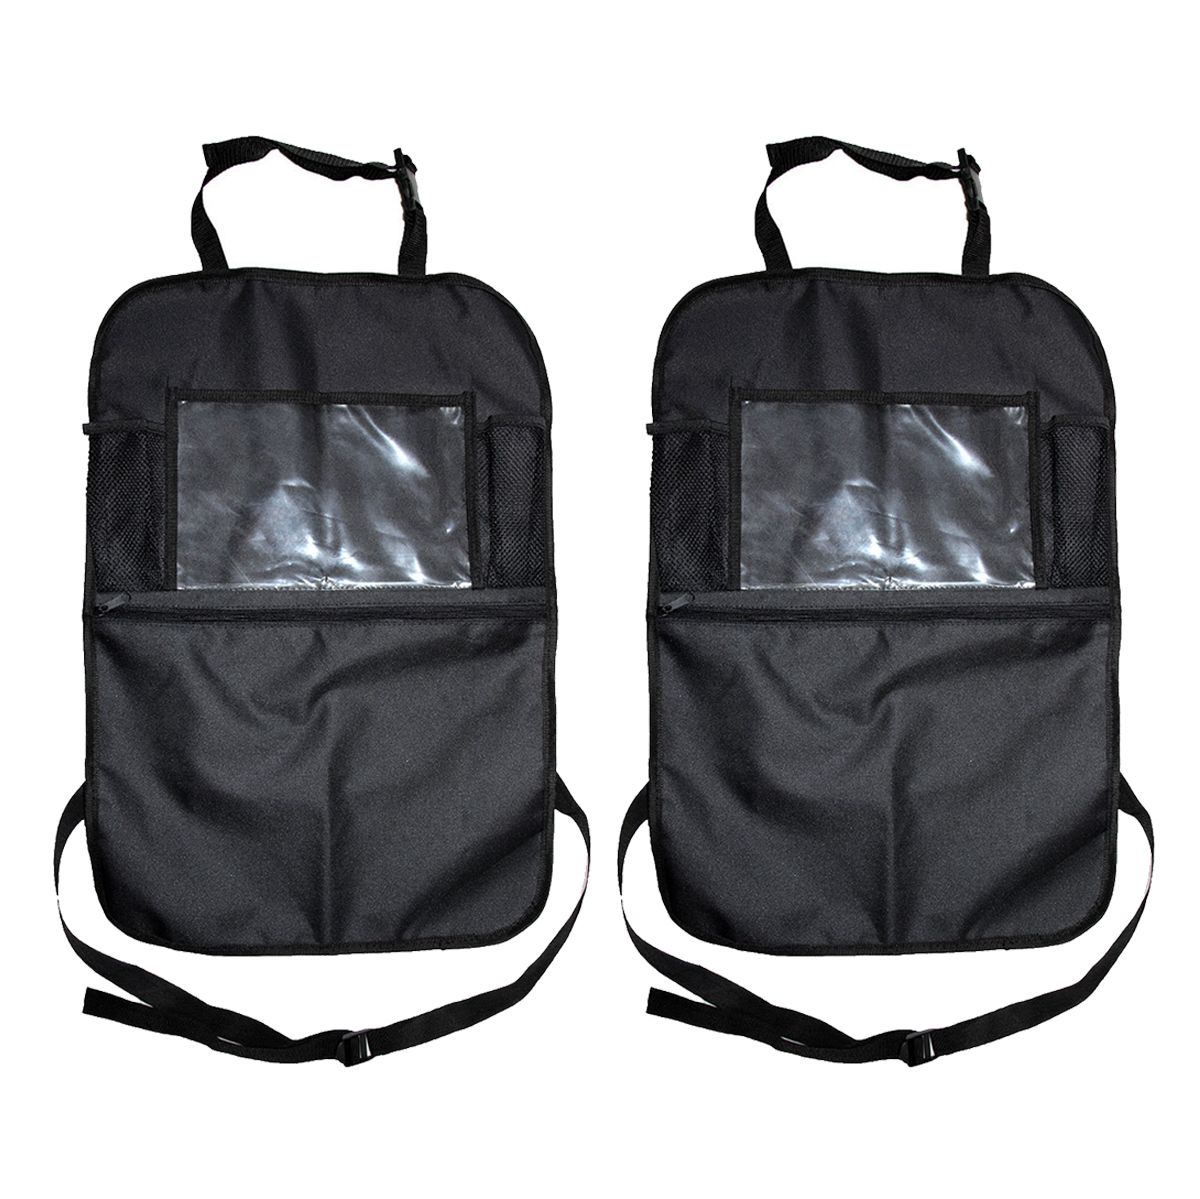 2PCS Car Organisers Kick Mats,Waterproof Car Seat Protectors Back Seat Storage Organiser Holder for Phones iPad Tablets and Sn